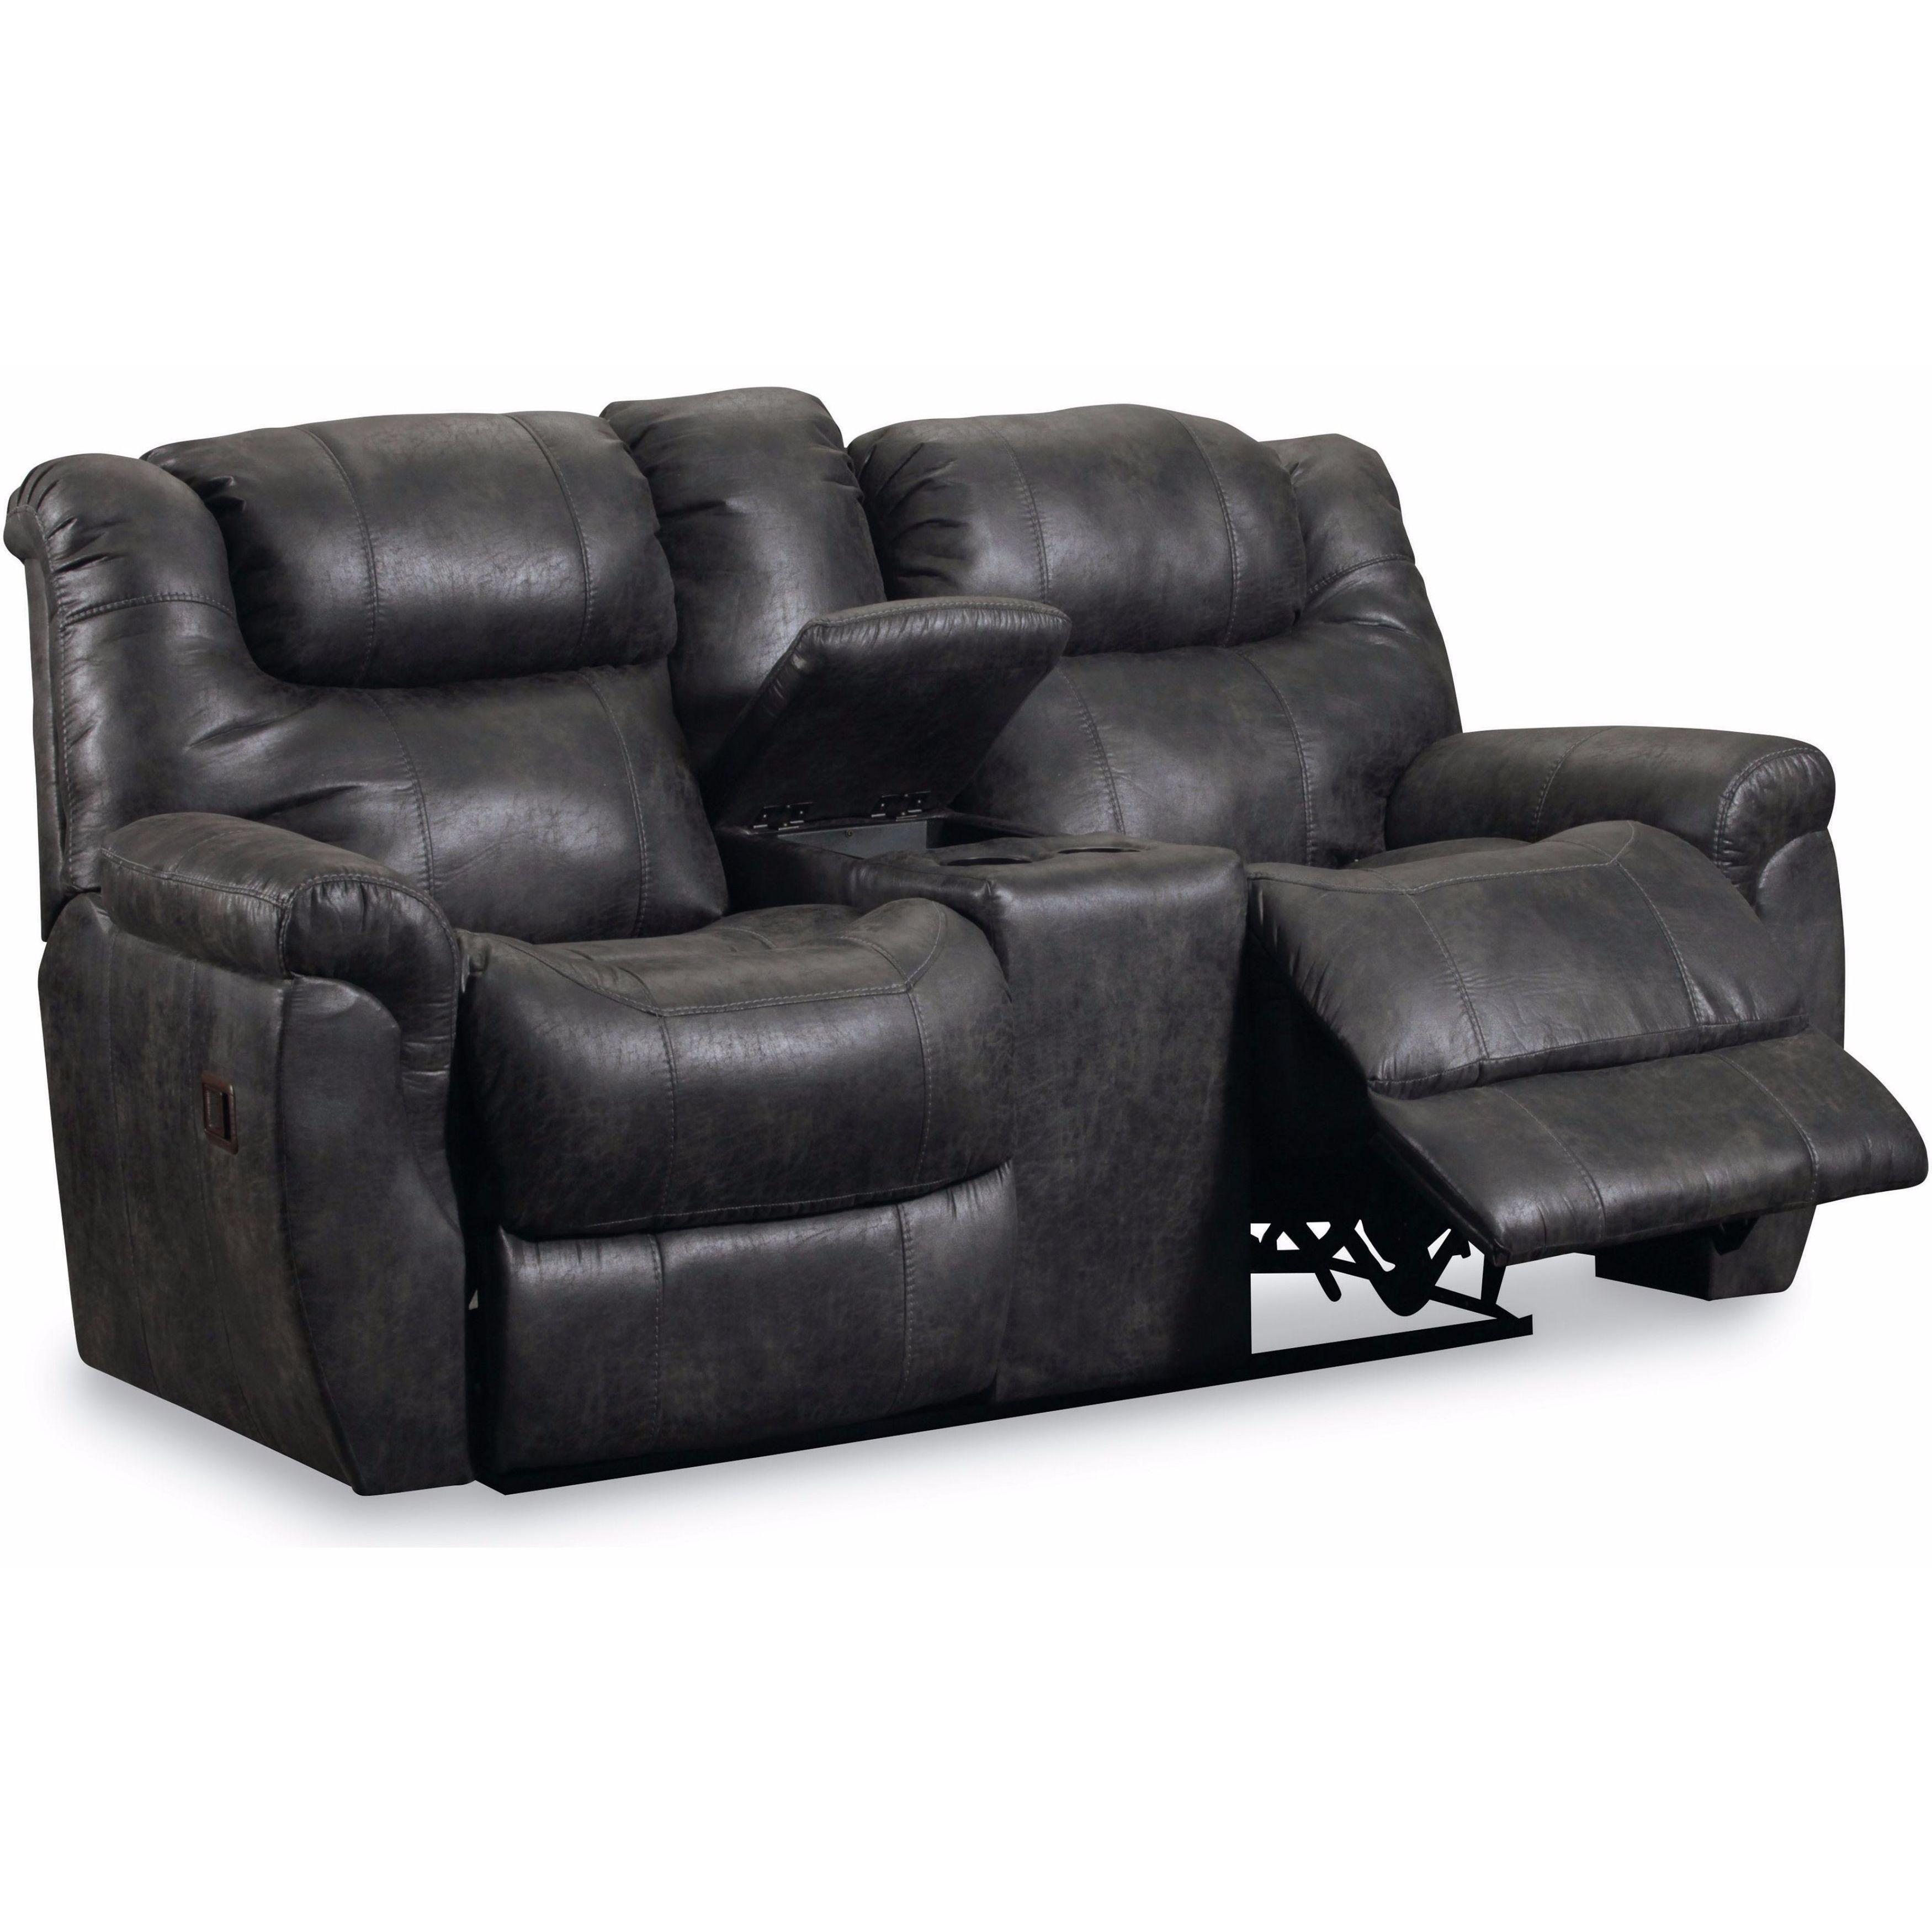 Lane Furniture Outlet #19 - Lane Furniture Summerlin Double Reclining Loveseat (Black) (Wood)